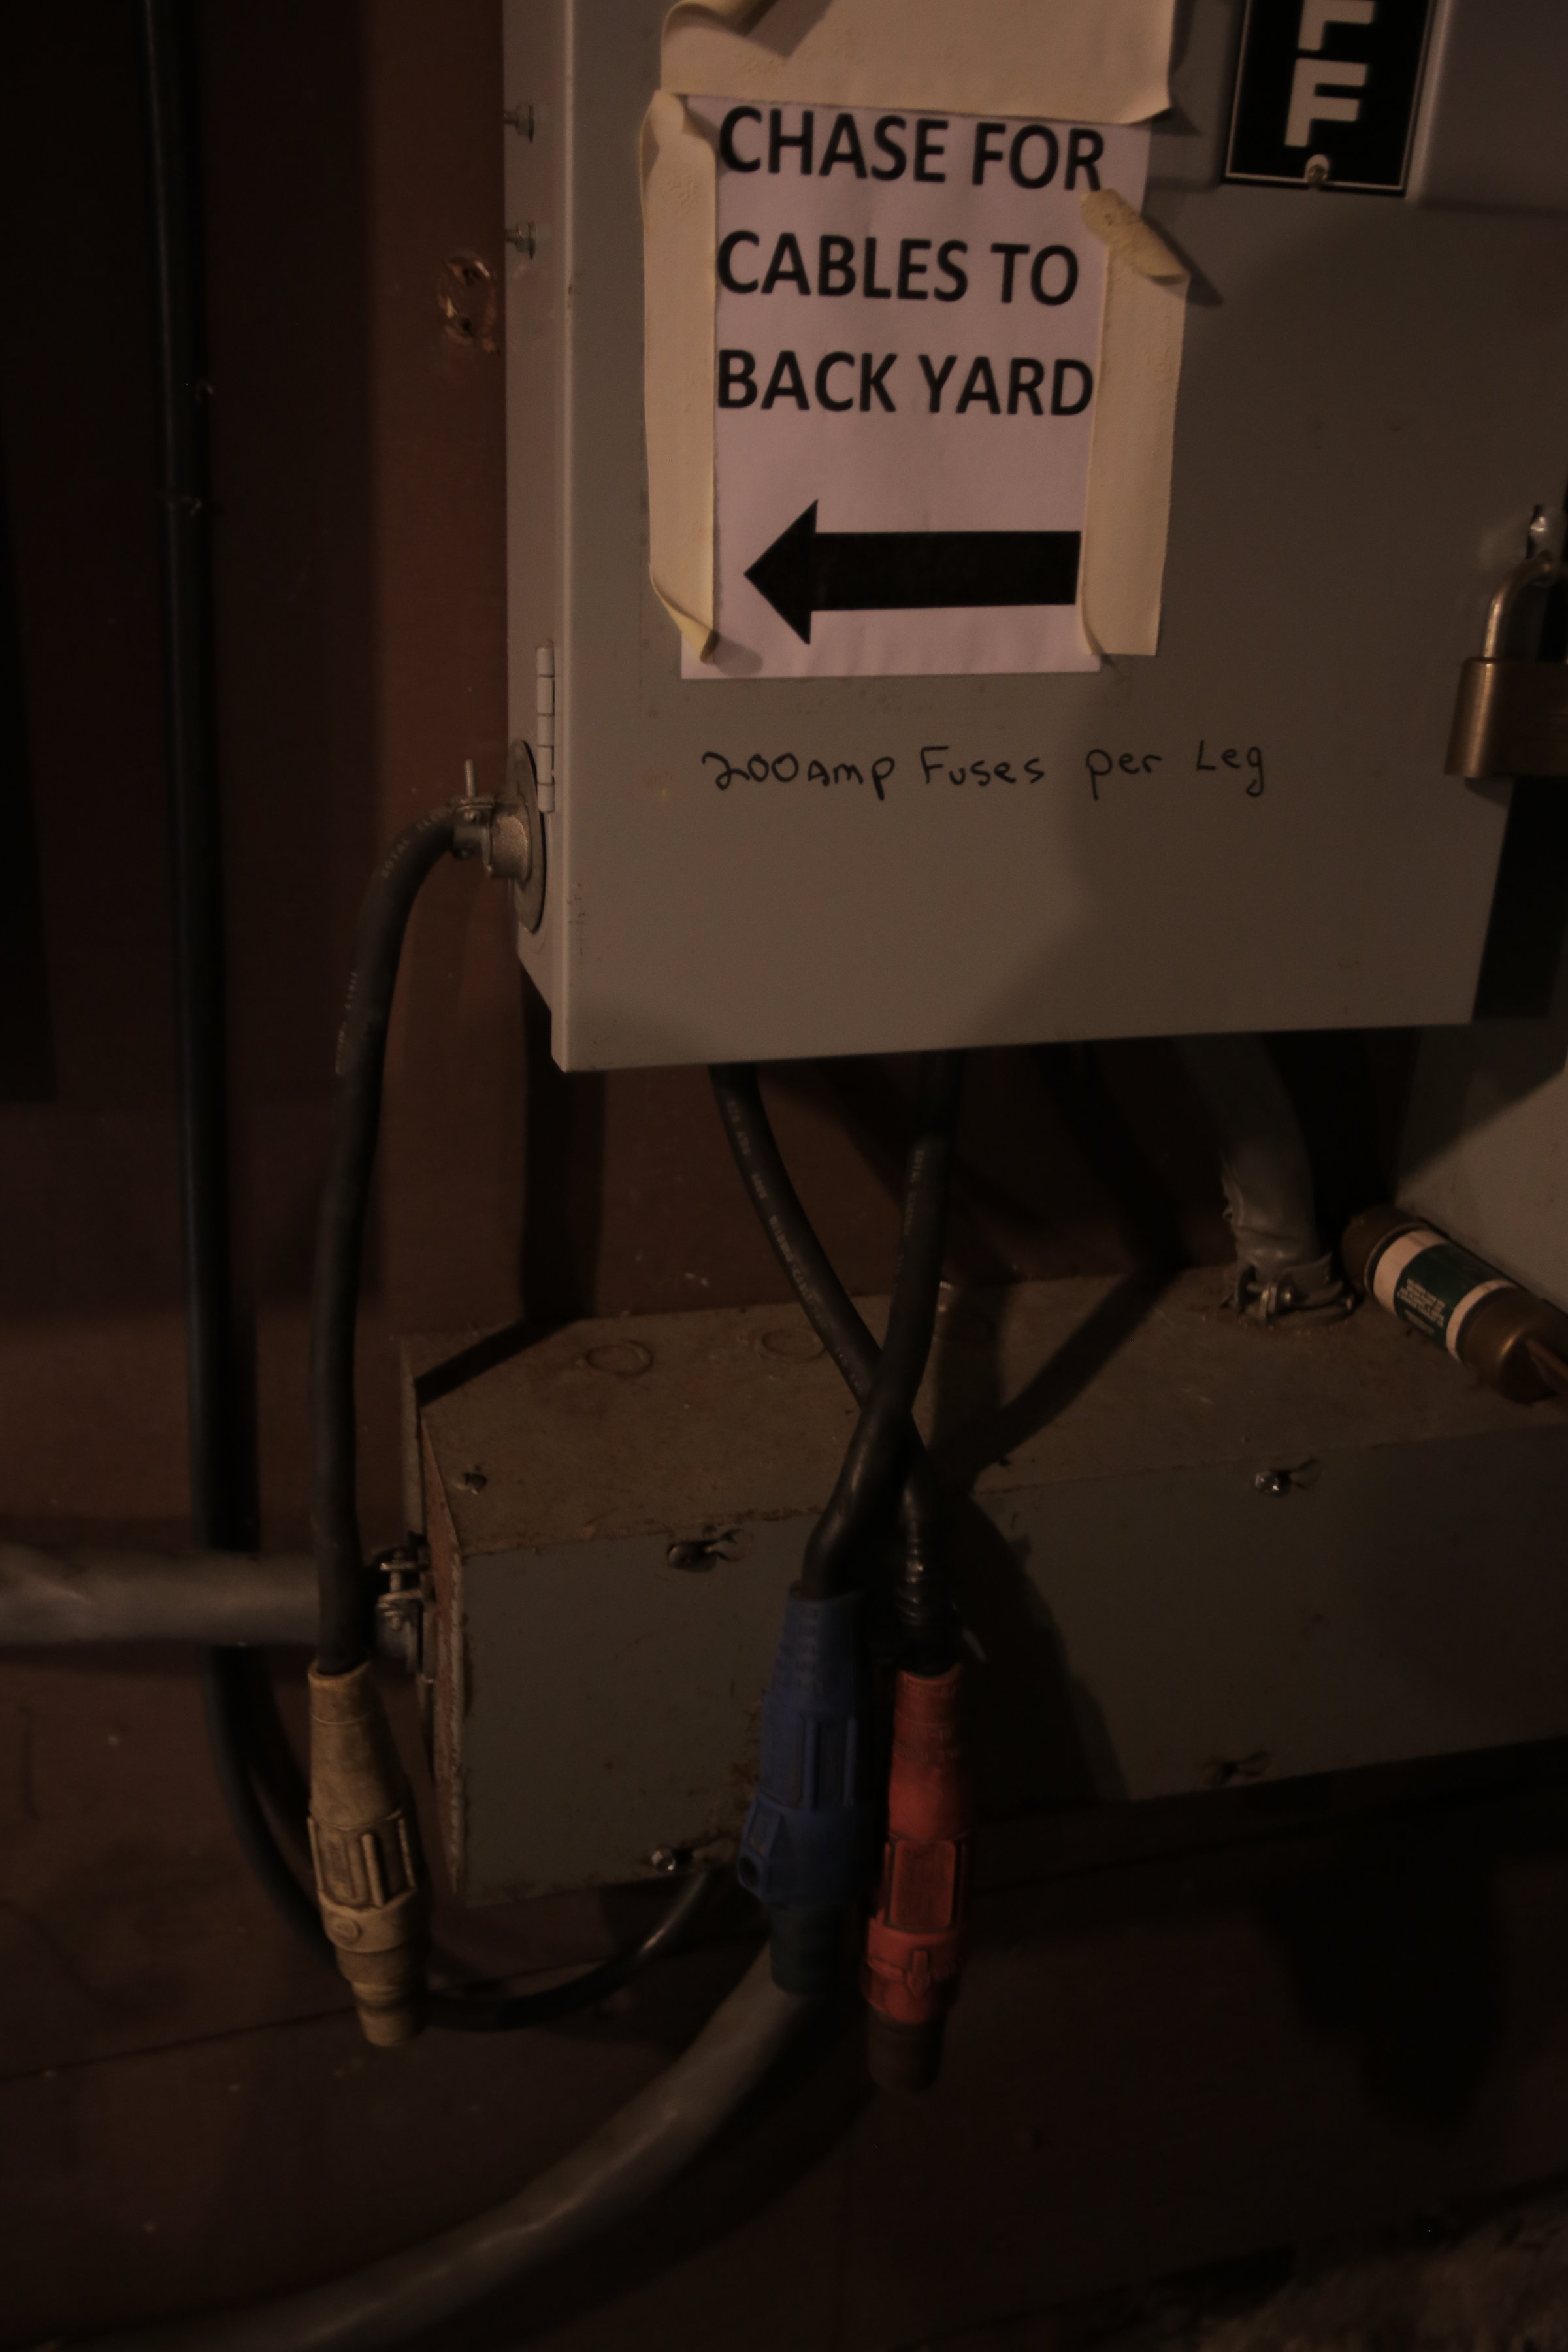 300AMP CAMLOCK BOX